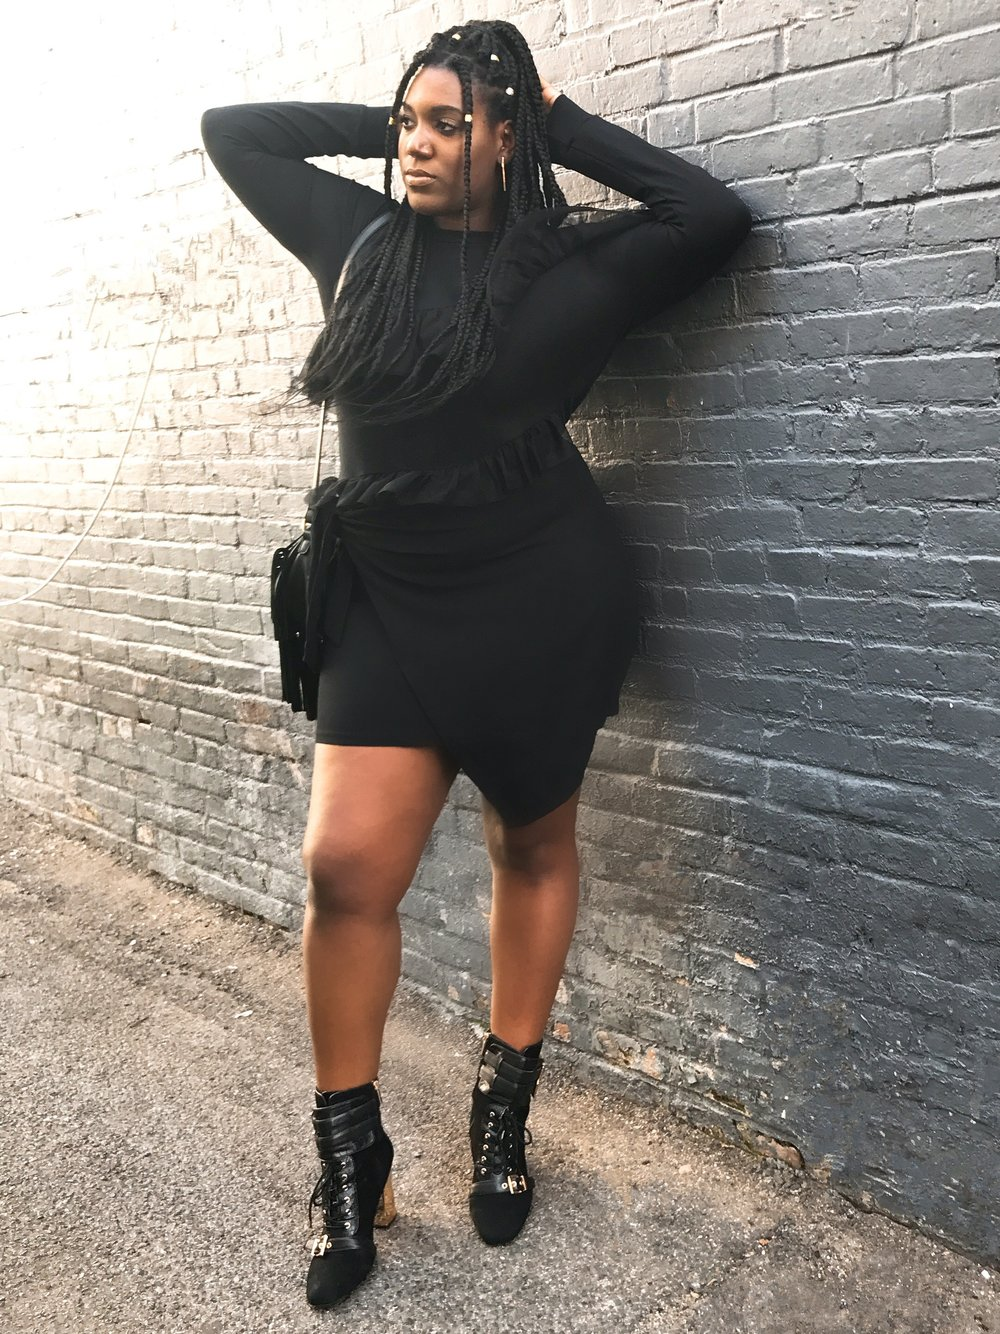 Black Top Black Skirt Black Boots.jpg